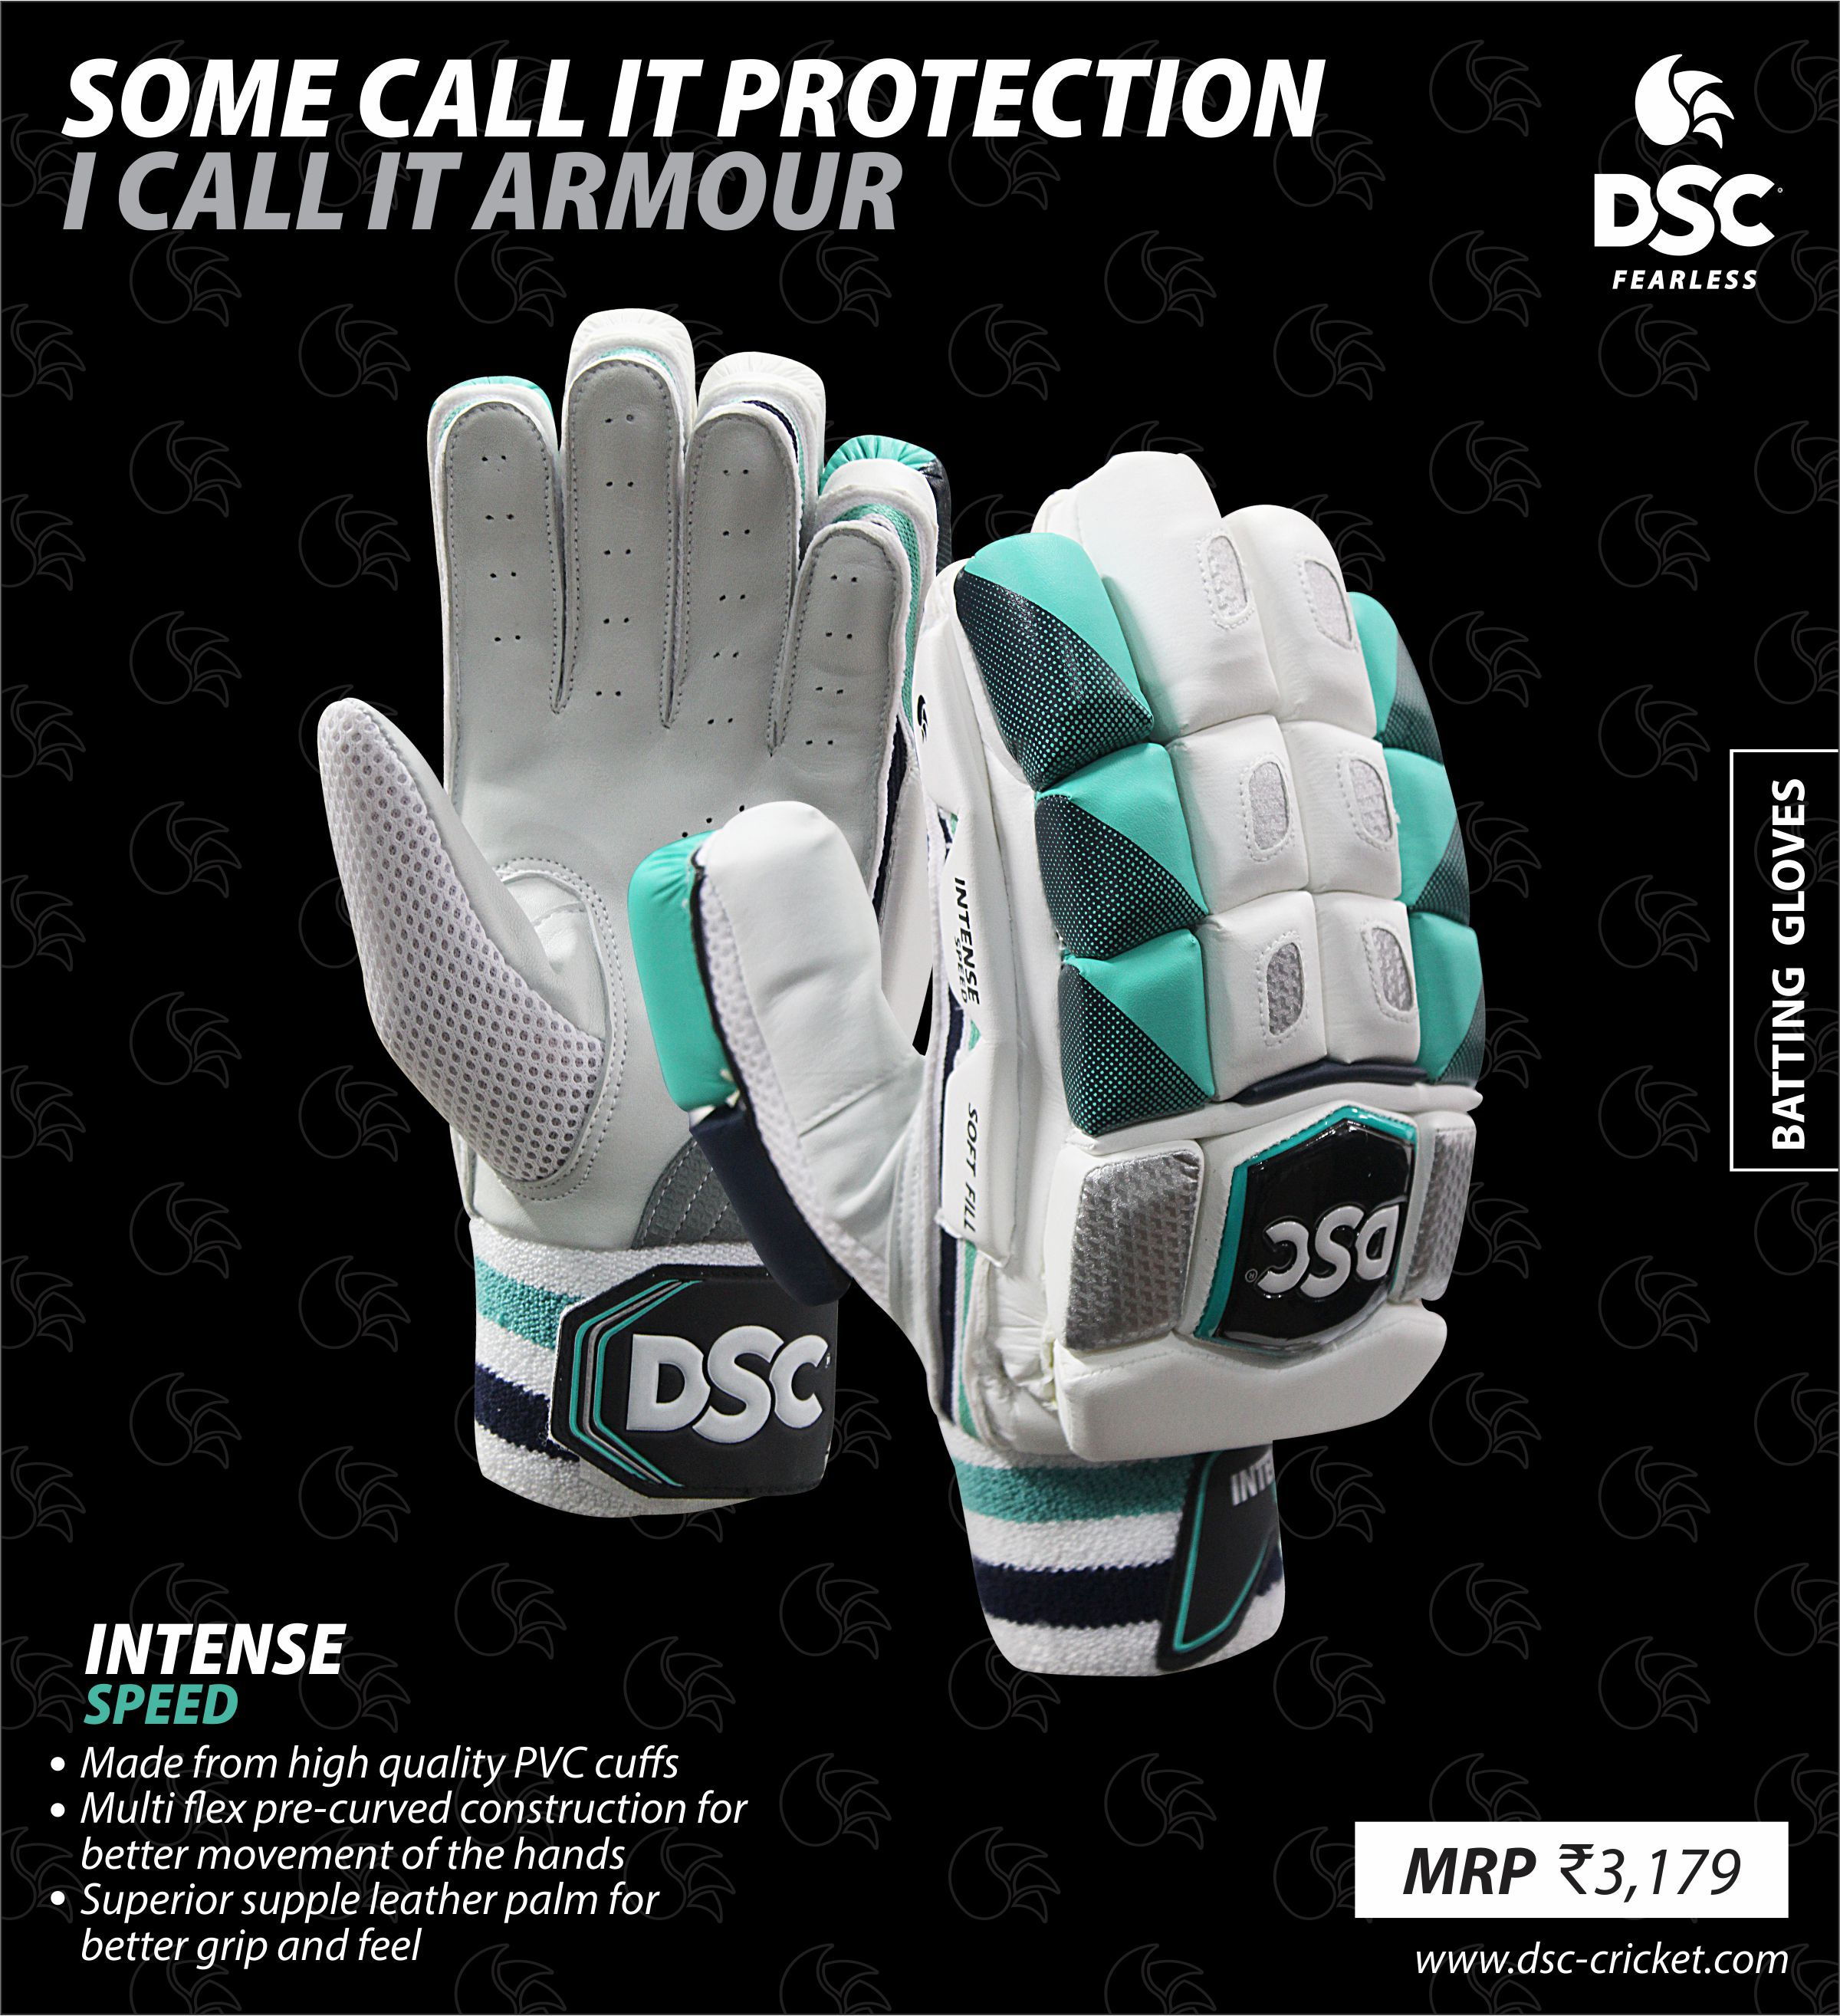 Dsc Intense Speed Premium Quality Batting Gloves Only For Rs 3 179 To Buy Visit The Website Batting Gloves Gloves Cricket Gloves